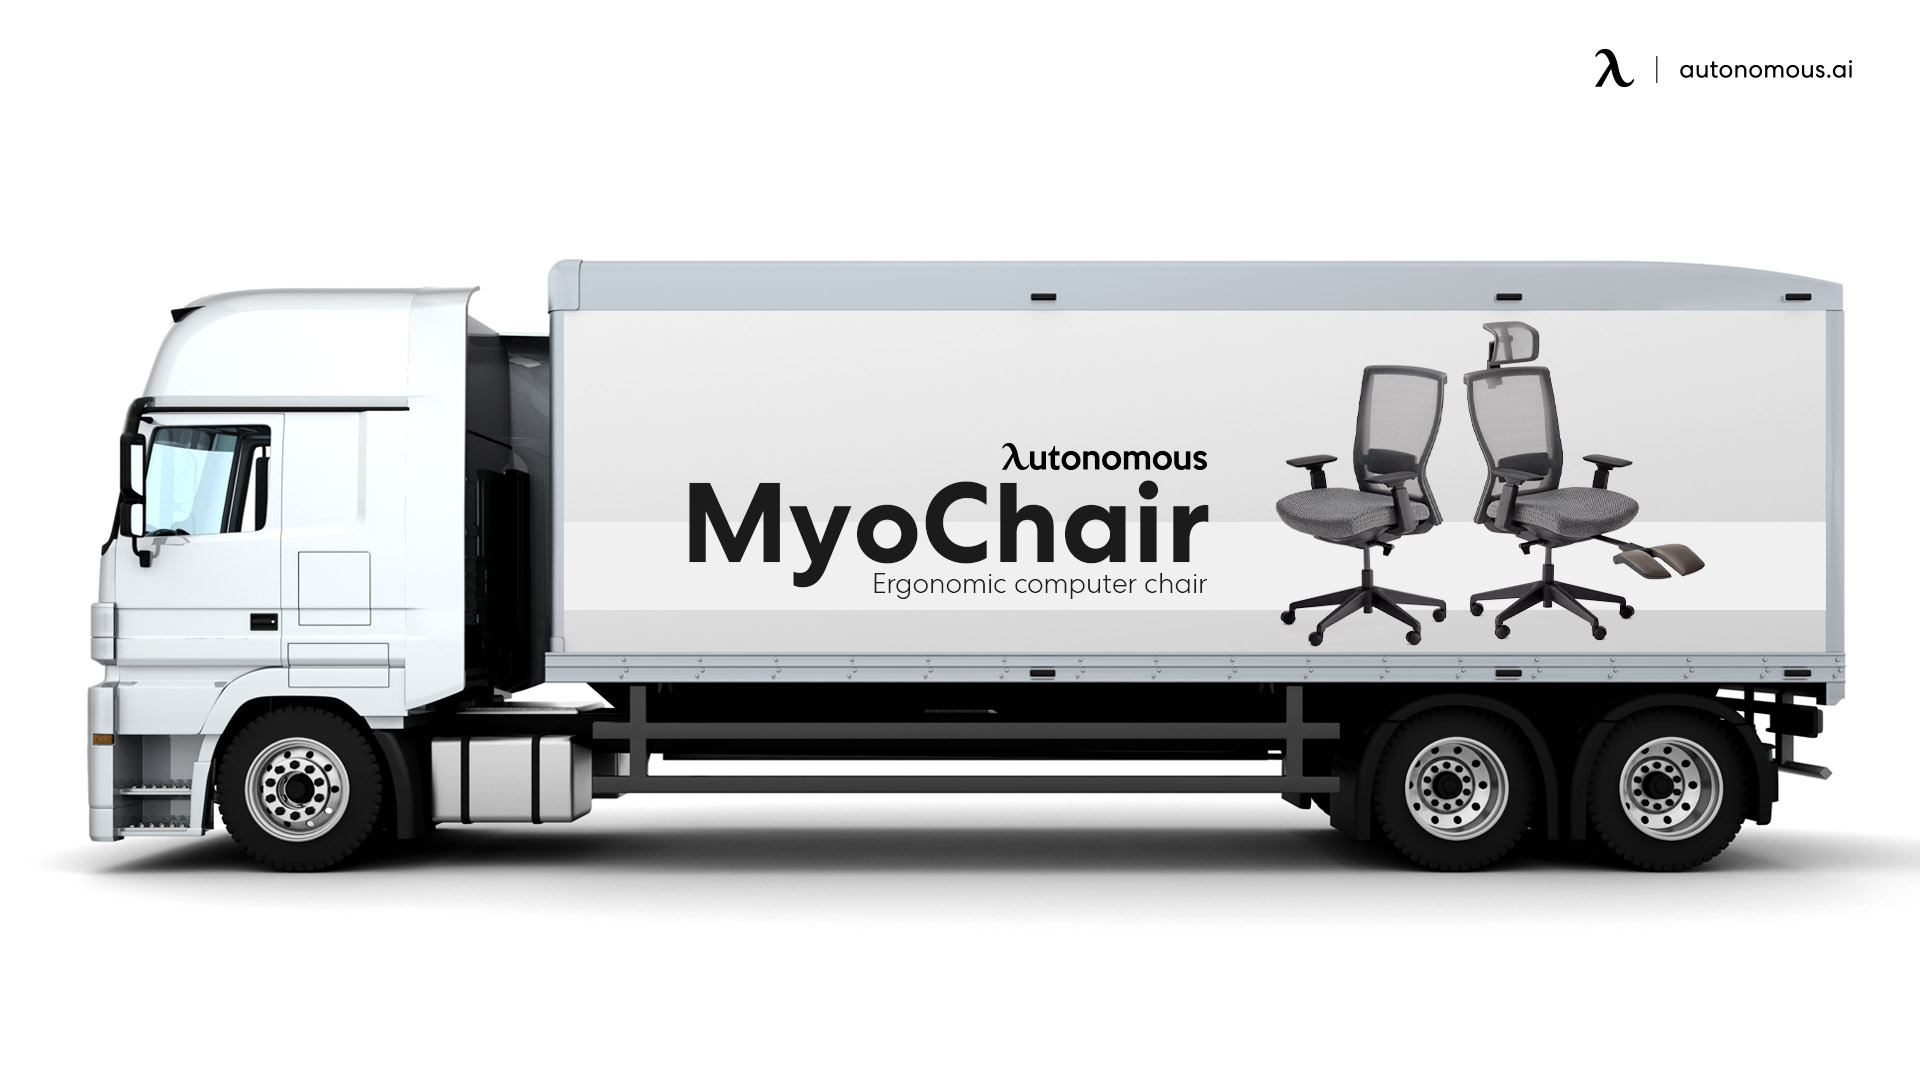 MyoChair shipping